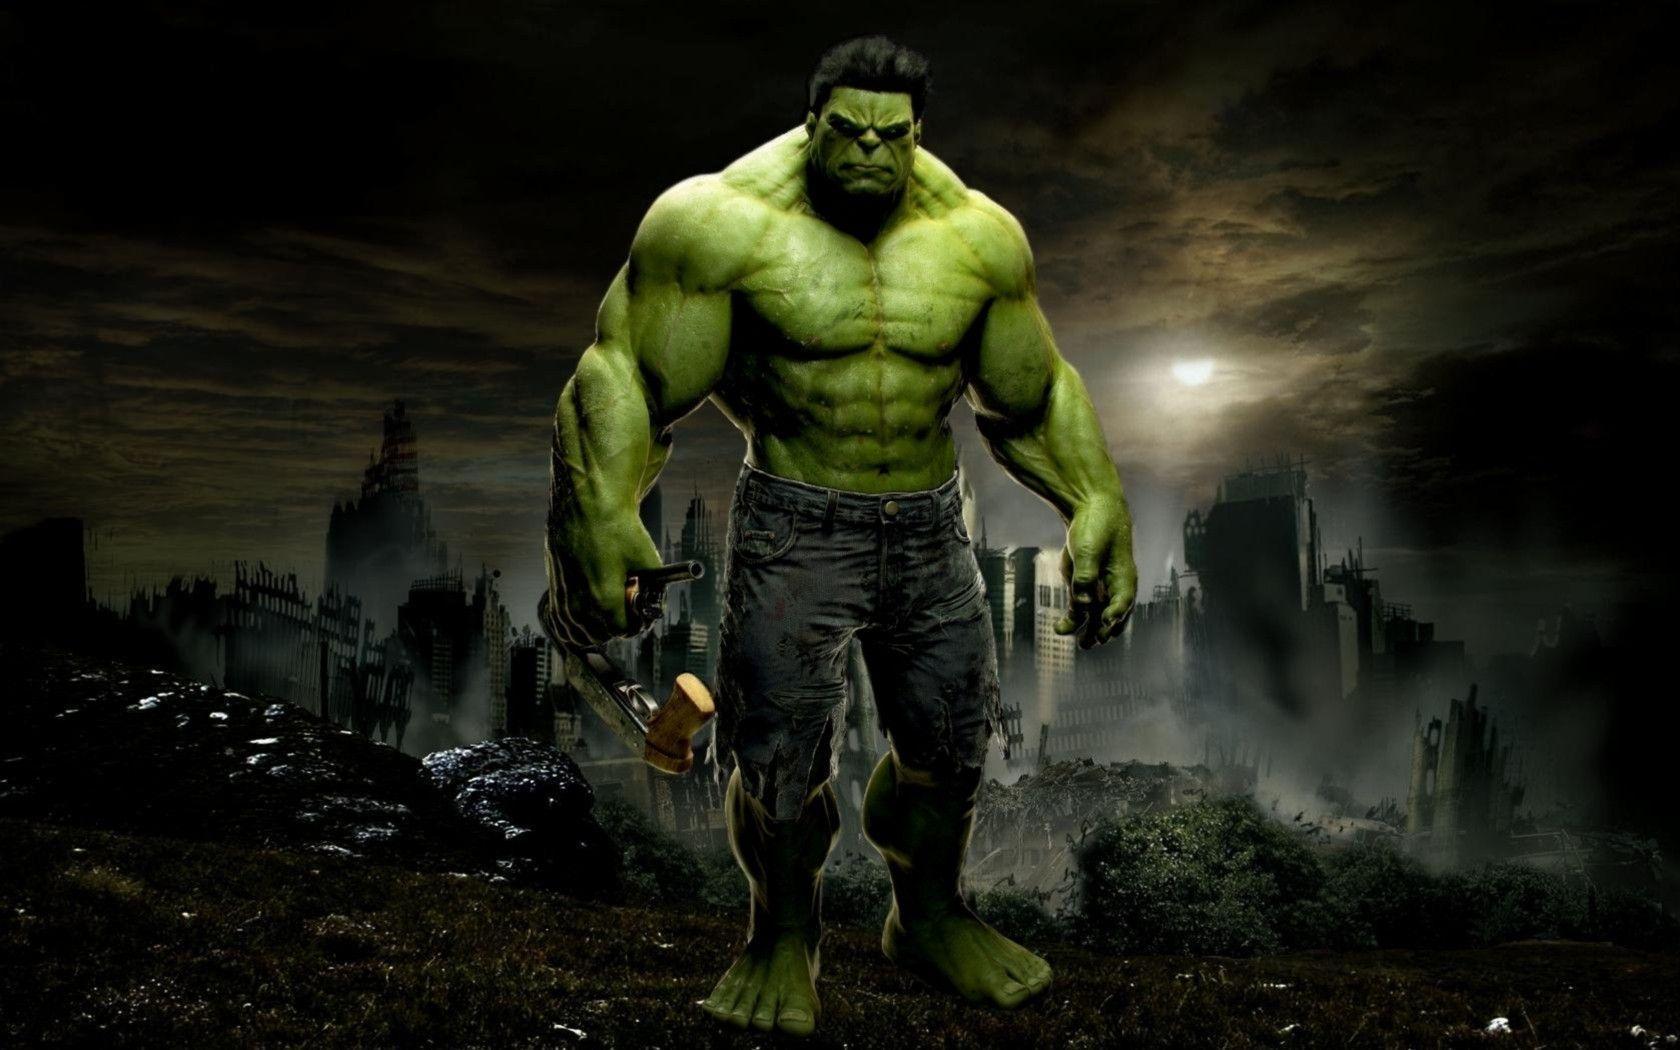 Marvel Hulk Wallpapers   Top Marvel Hulk Backgrounds 1680x1050